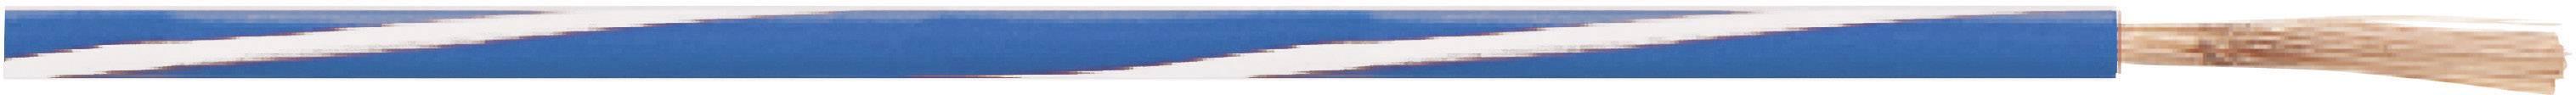 Opletenie / lanko LappKabel 4512272S X05V-K, 1 x 0.75 mm², vonkajší Ø 2.40 mm, metrový tovar, hnedá, čierna